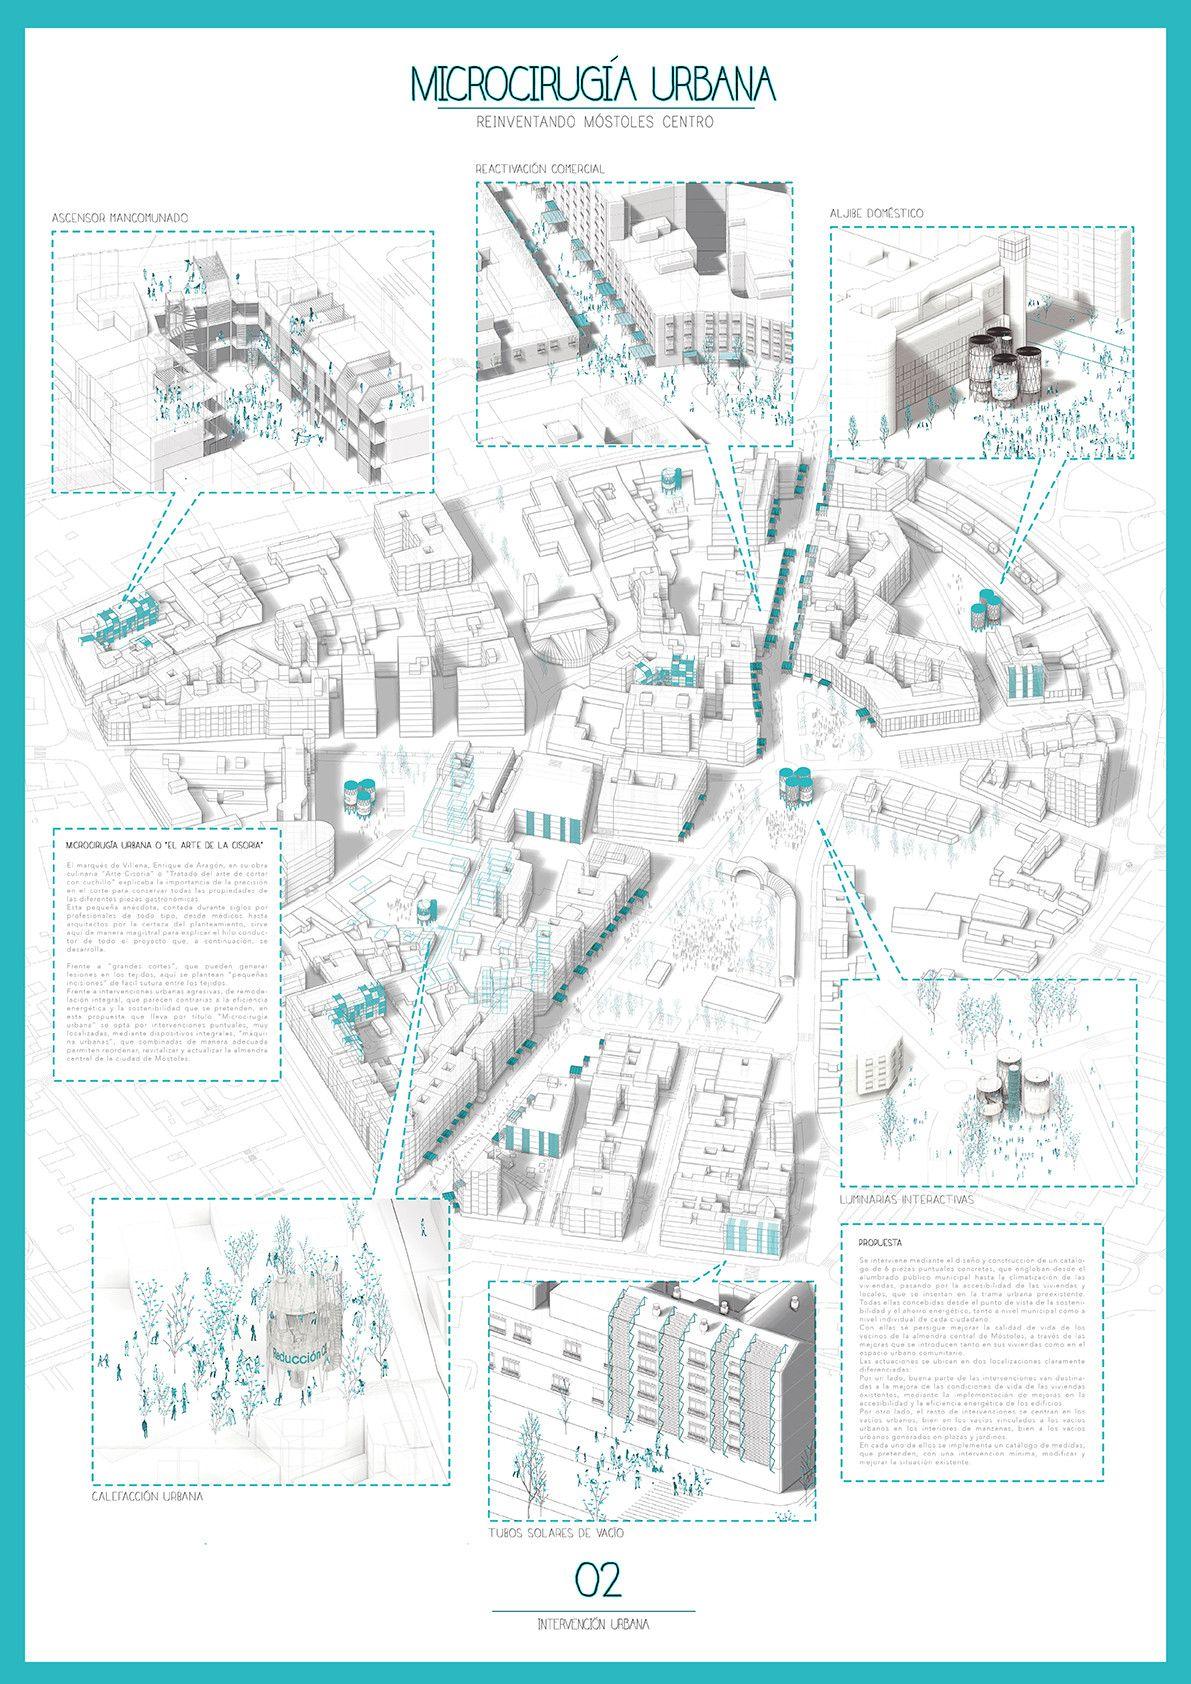 Galera de microciruga urbana primer lugar en concurso imagen 9 de 9 de la galera de microciruga urbana primer lugar en concurso reinventar pooptronica Image collections